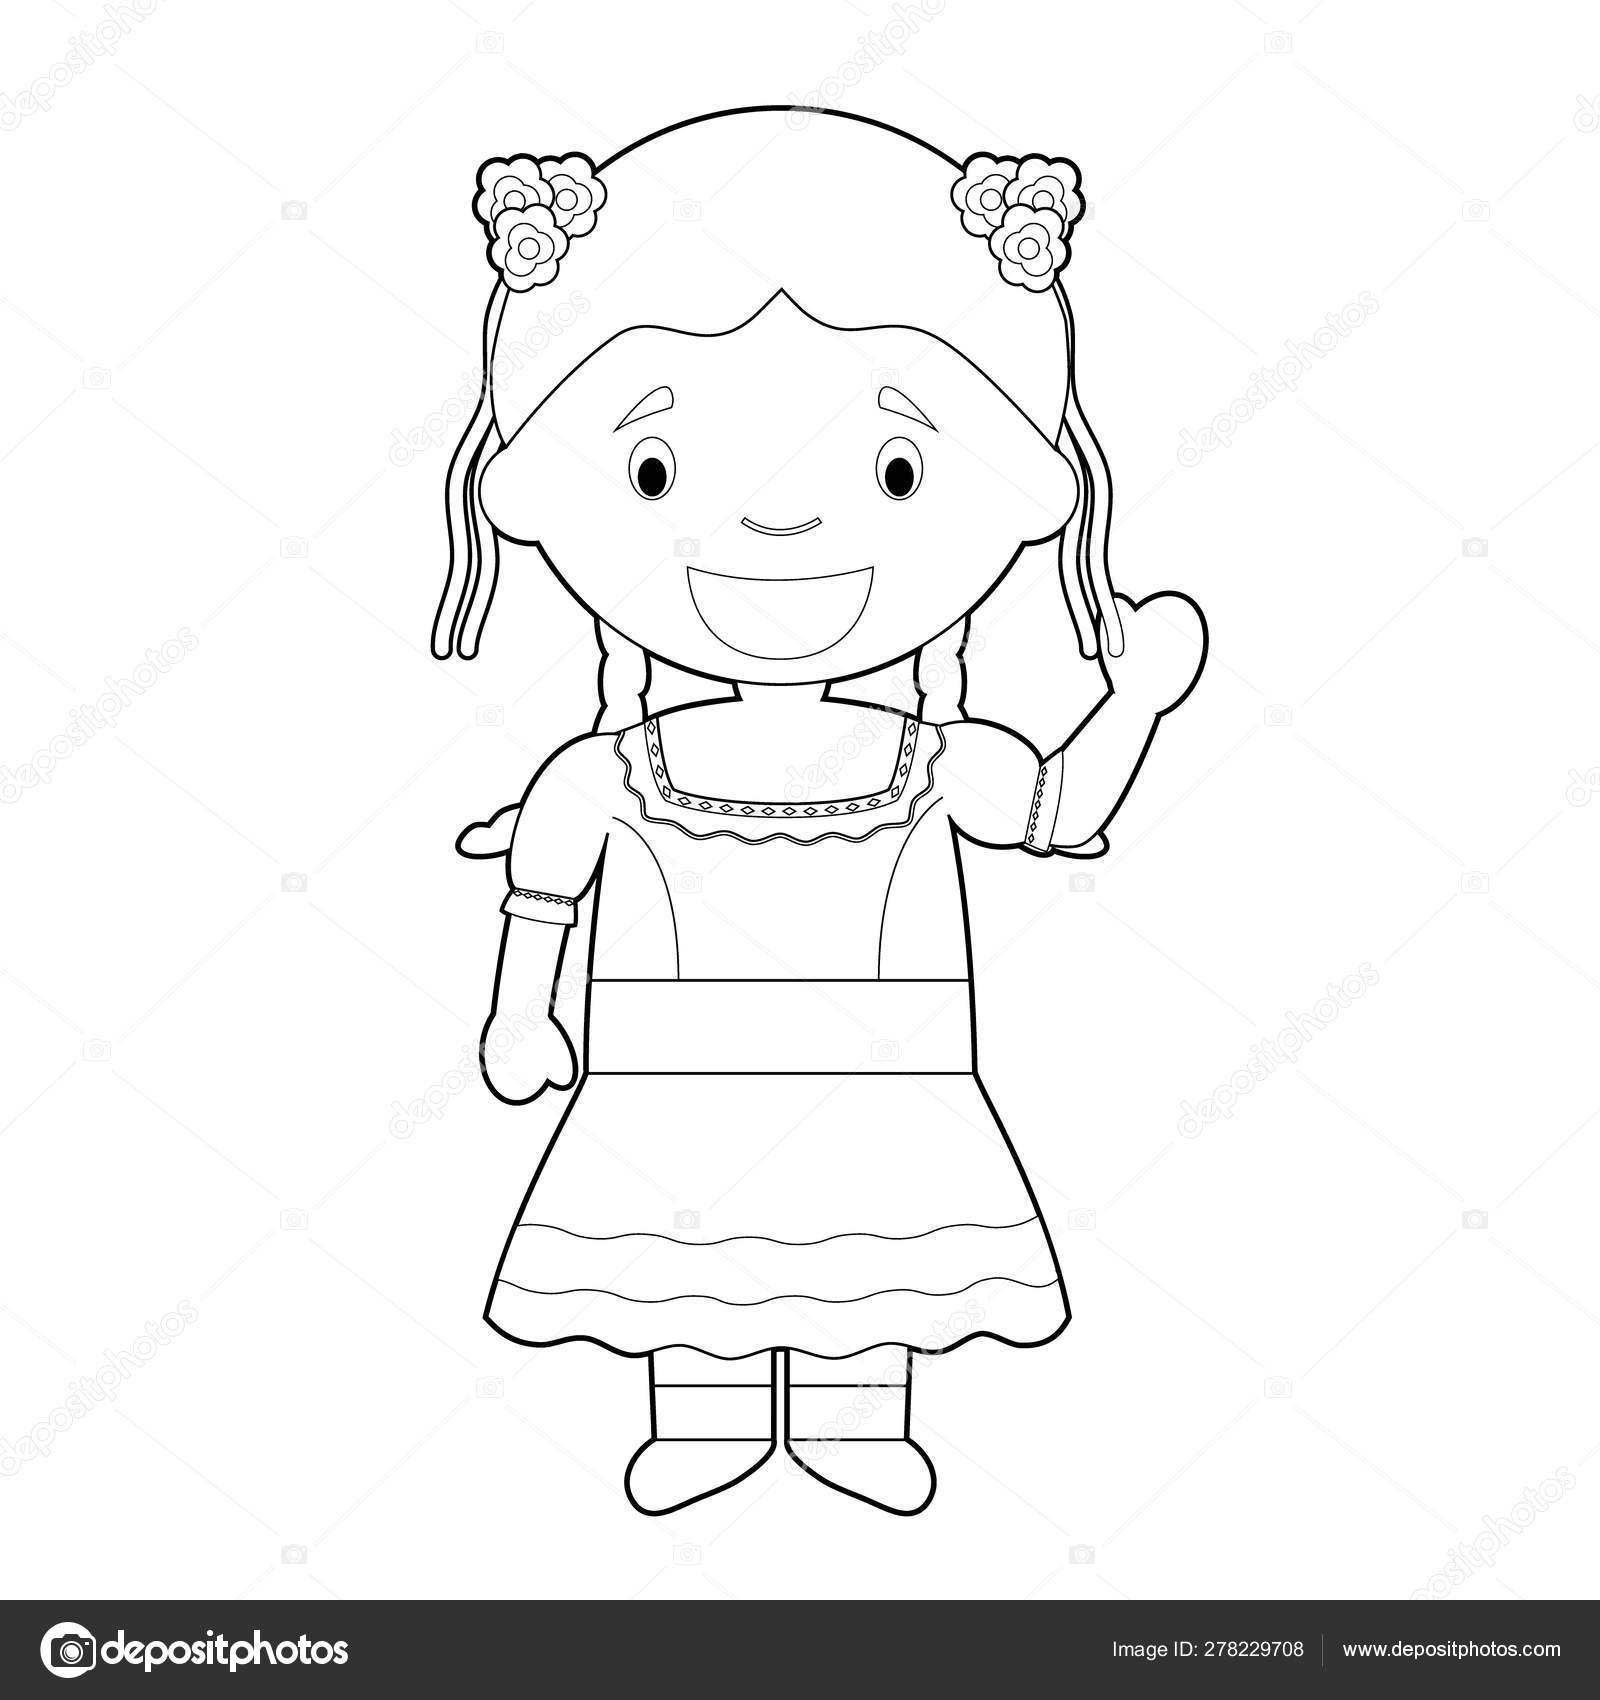 Personaje Dibujos Animados Para Colorear Fácil Chile Vestido